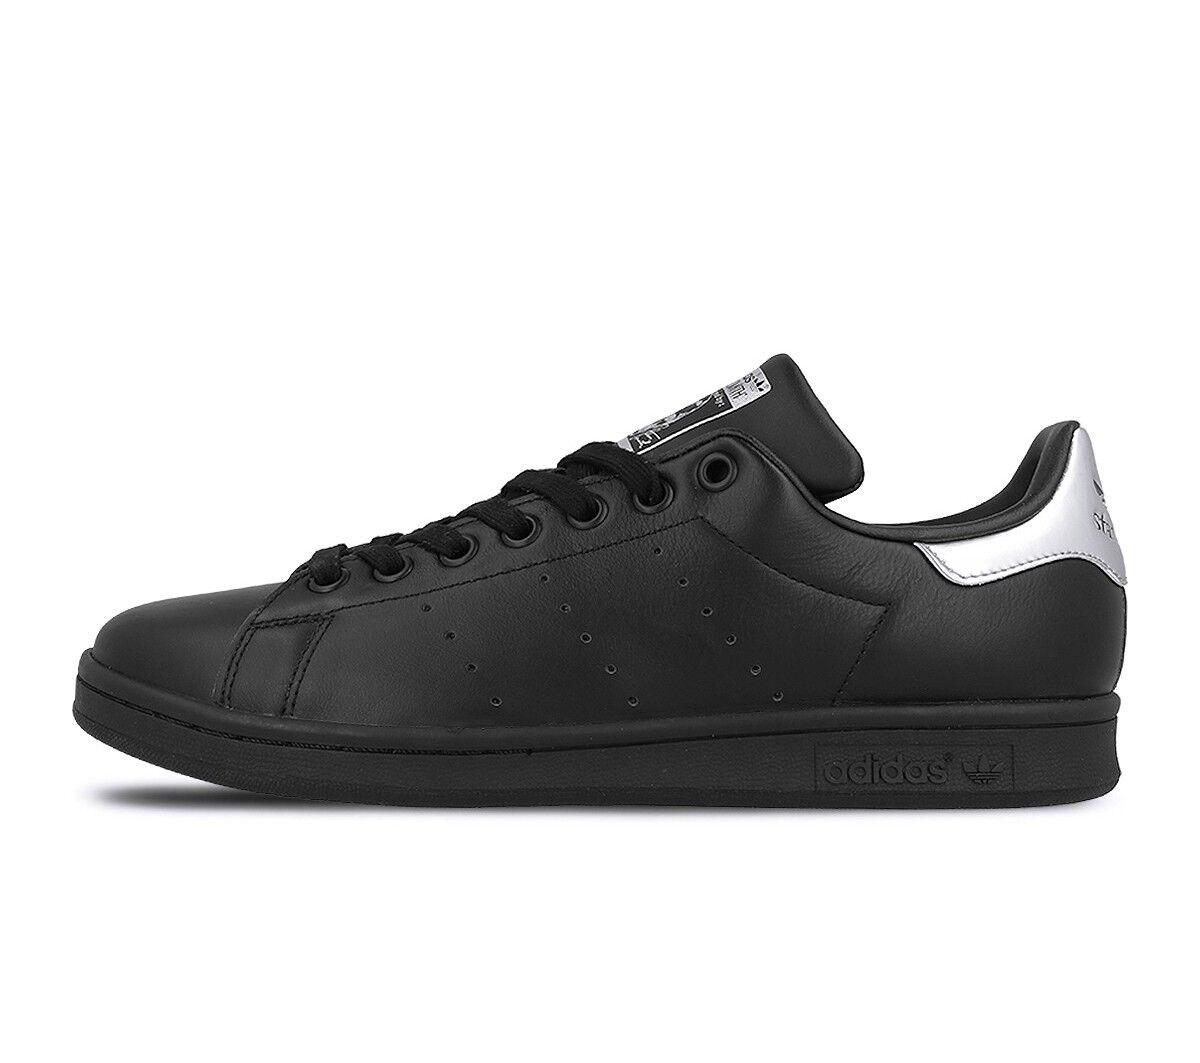 NEU ADIDAS WOMEN'S ORIGINALS STAN SMITH Schuhe   BLACK//BLACK-MTLC SILVER